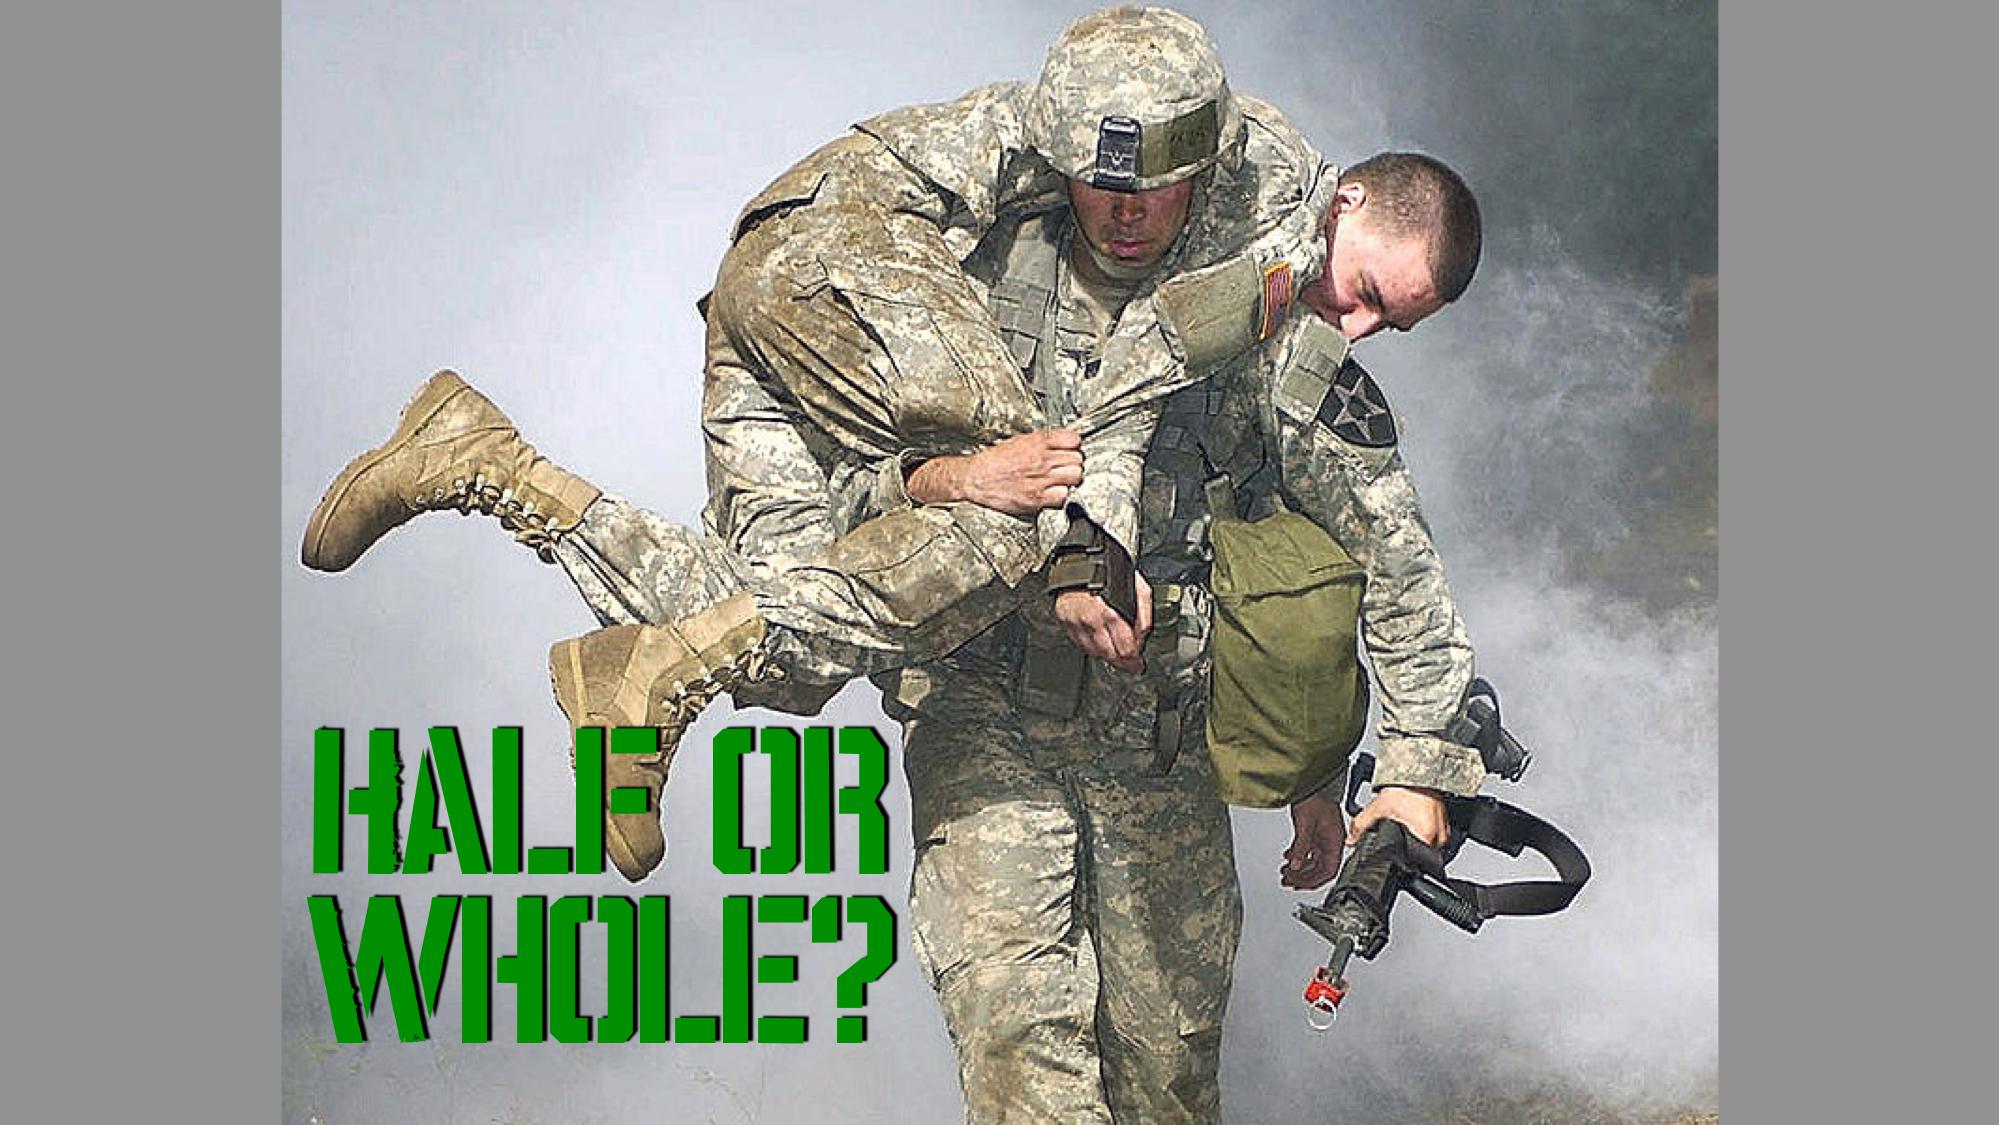 Half or Whole?